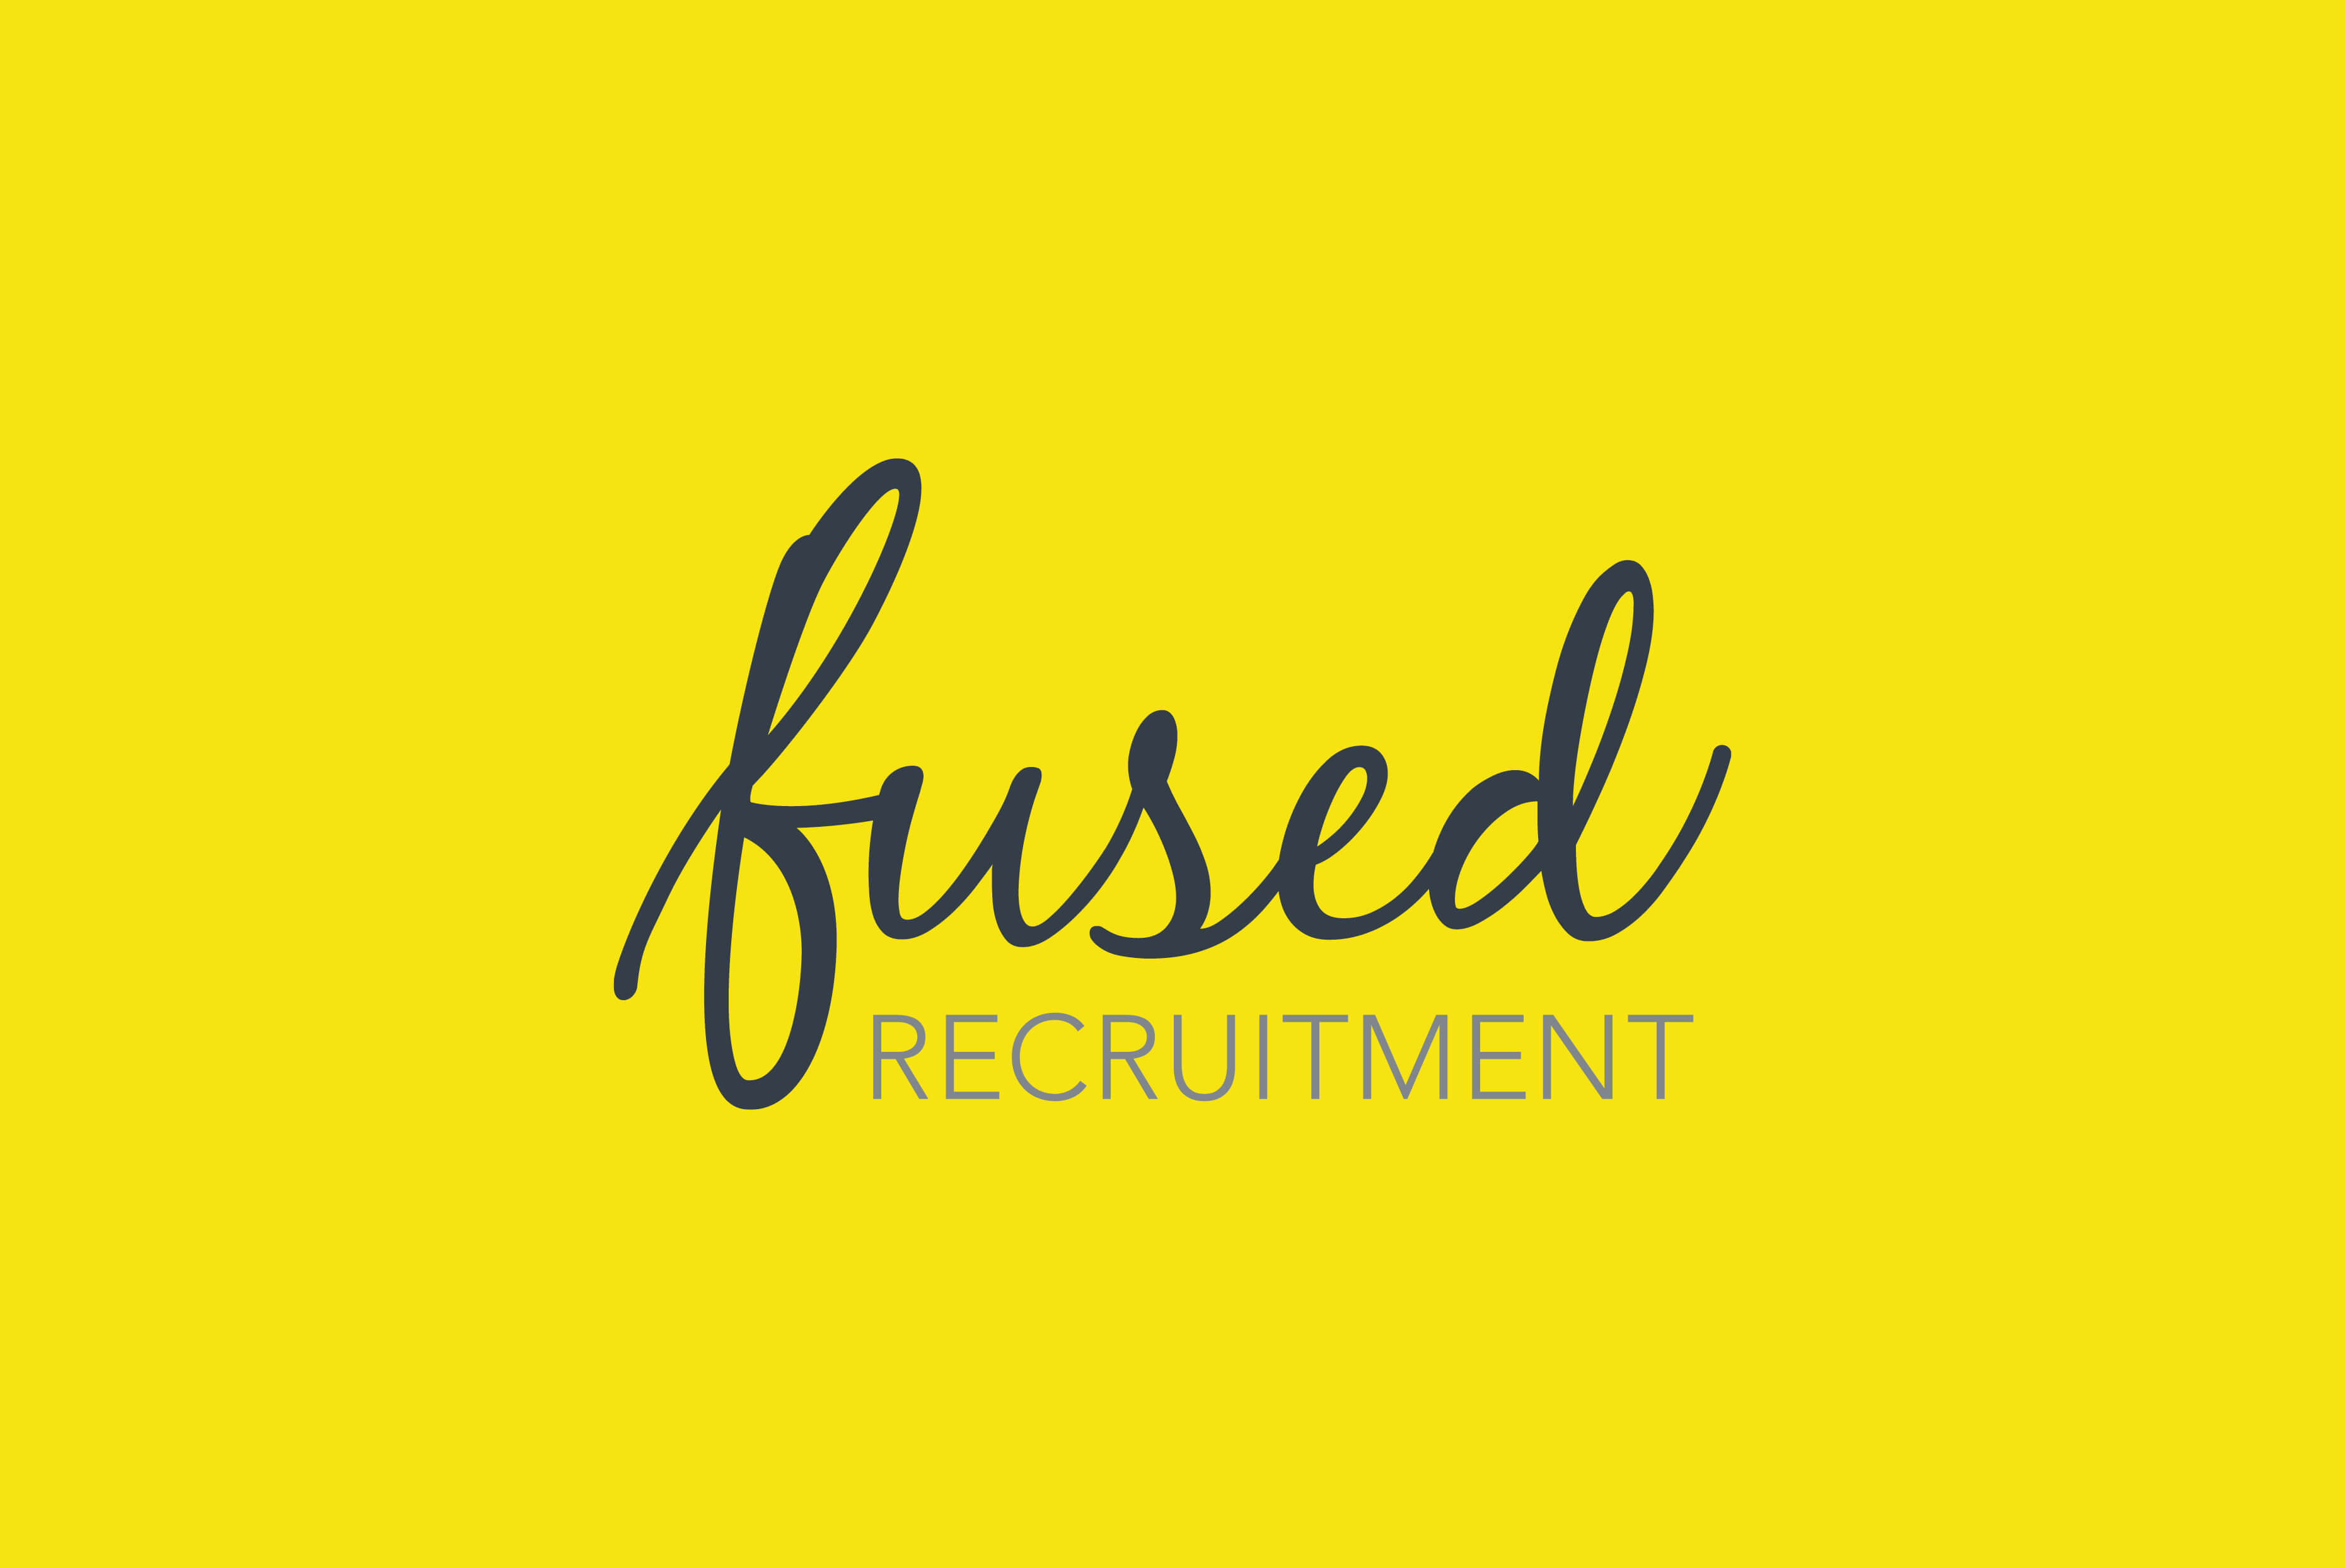 Fused Recruitment Branding | Independent Marketing - IM London | London Branding Agency